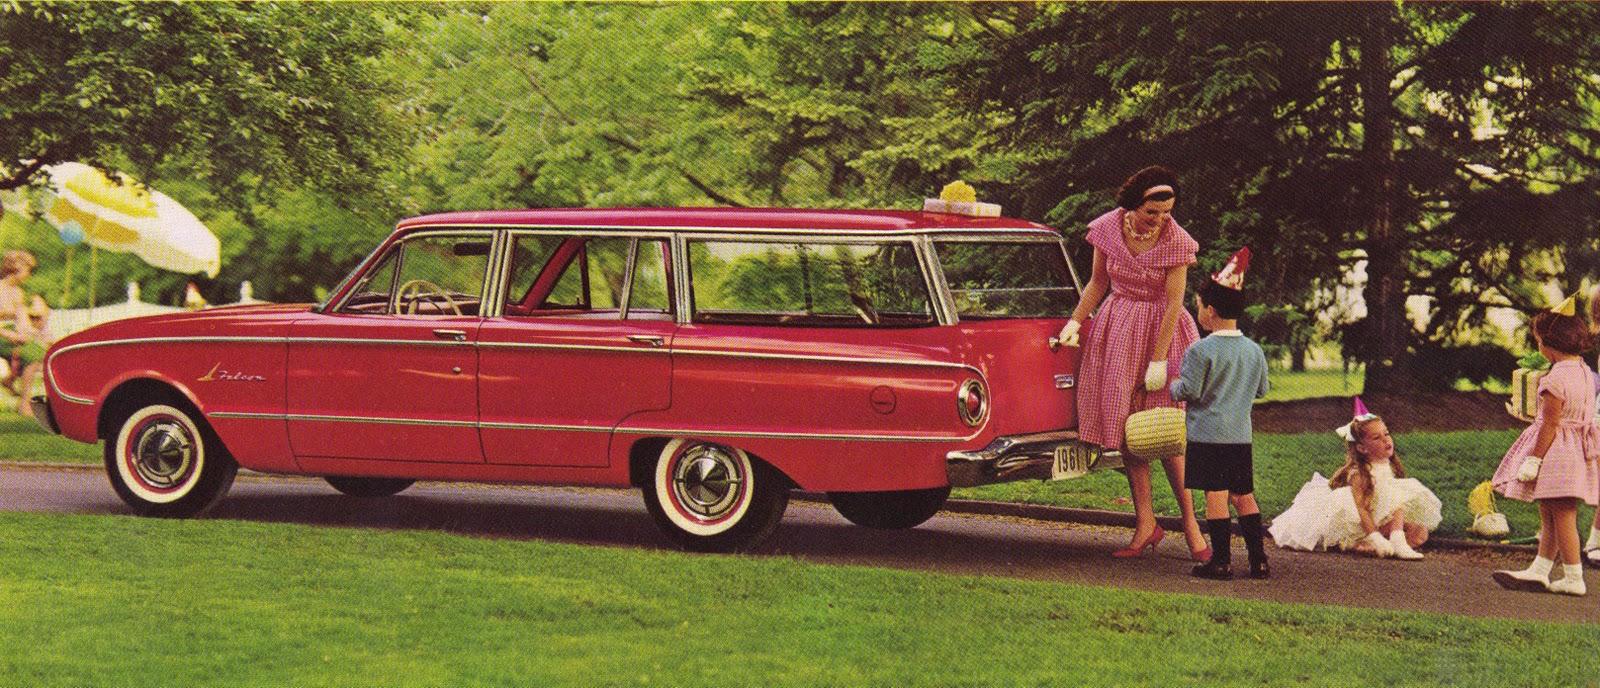 transpress nz: 1961 Ford Falcon station wagon